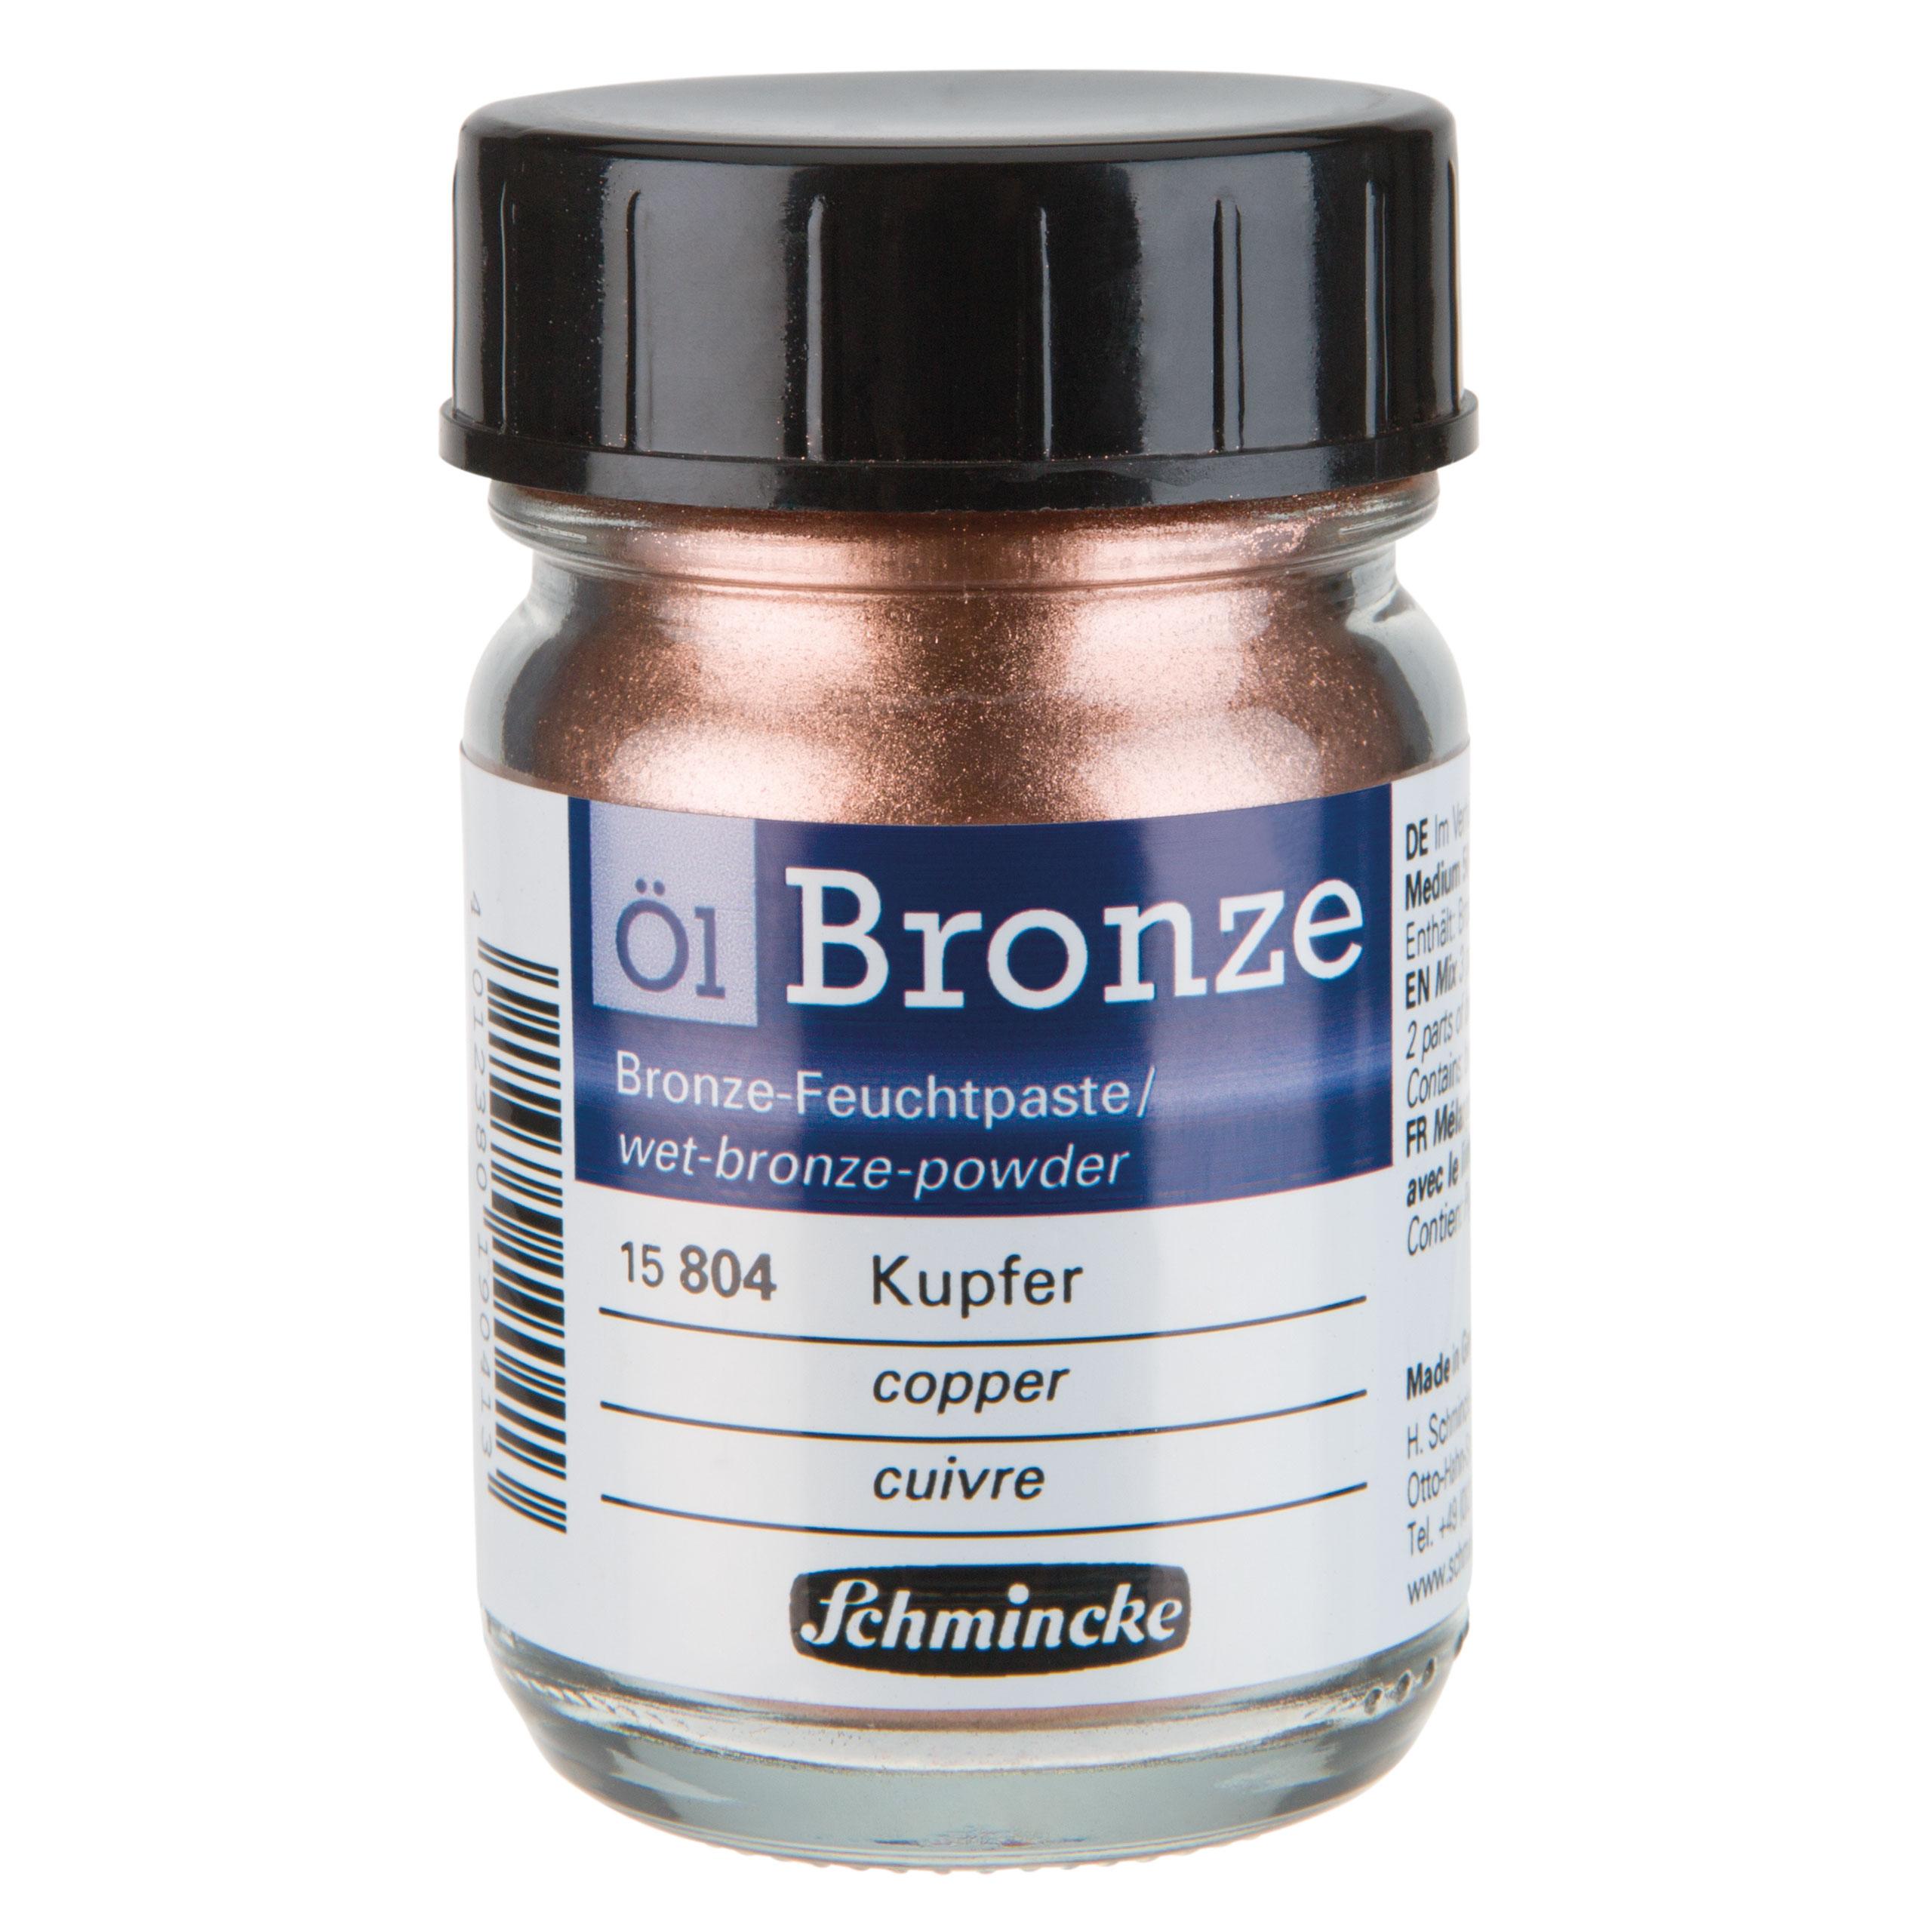 Kupfer - Öl Bronze 50ml Schmincke 15 804 024 ***